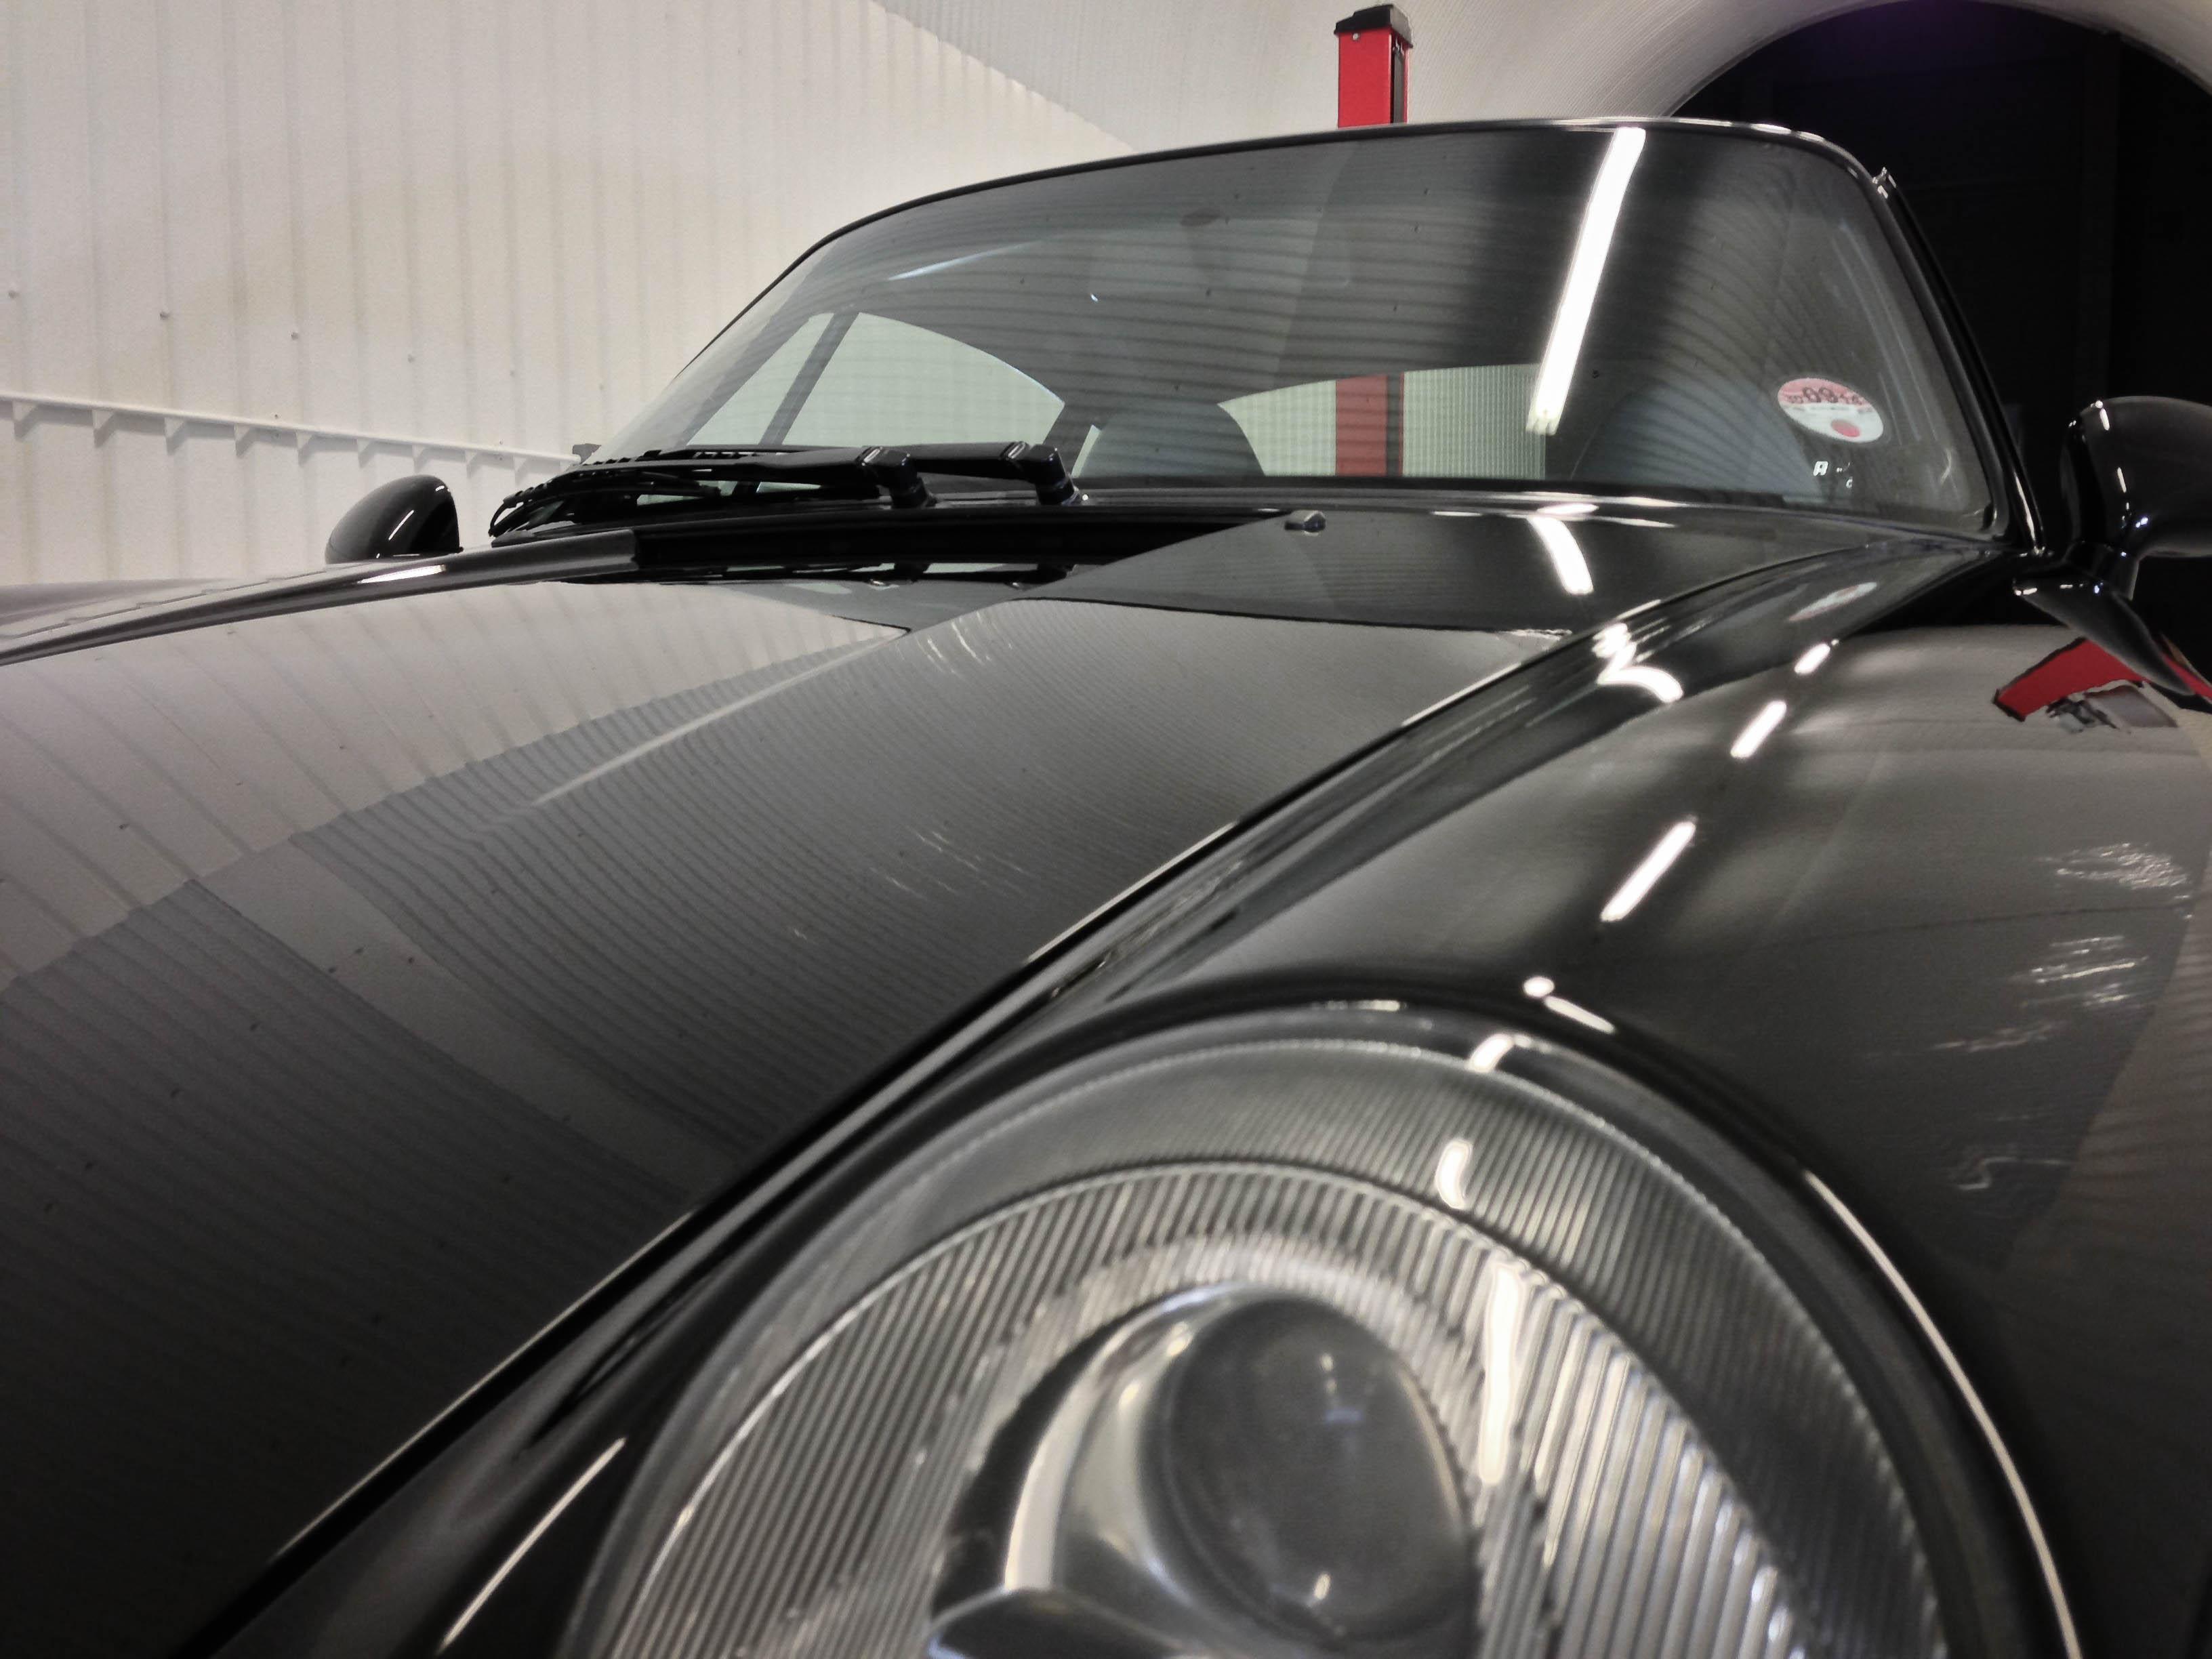 Porsche 911 Turbo – Close up